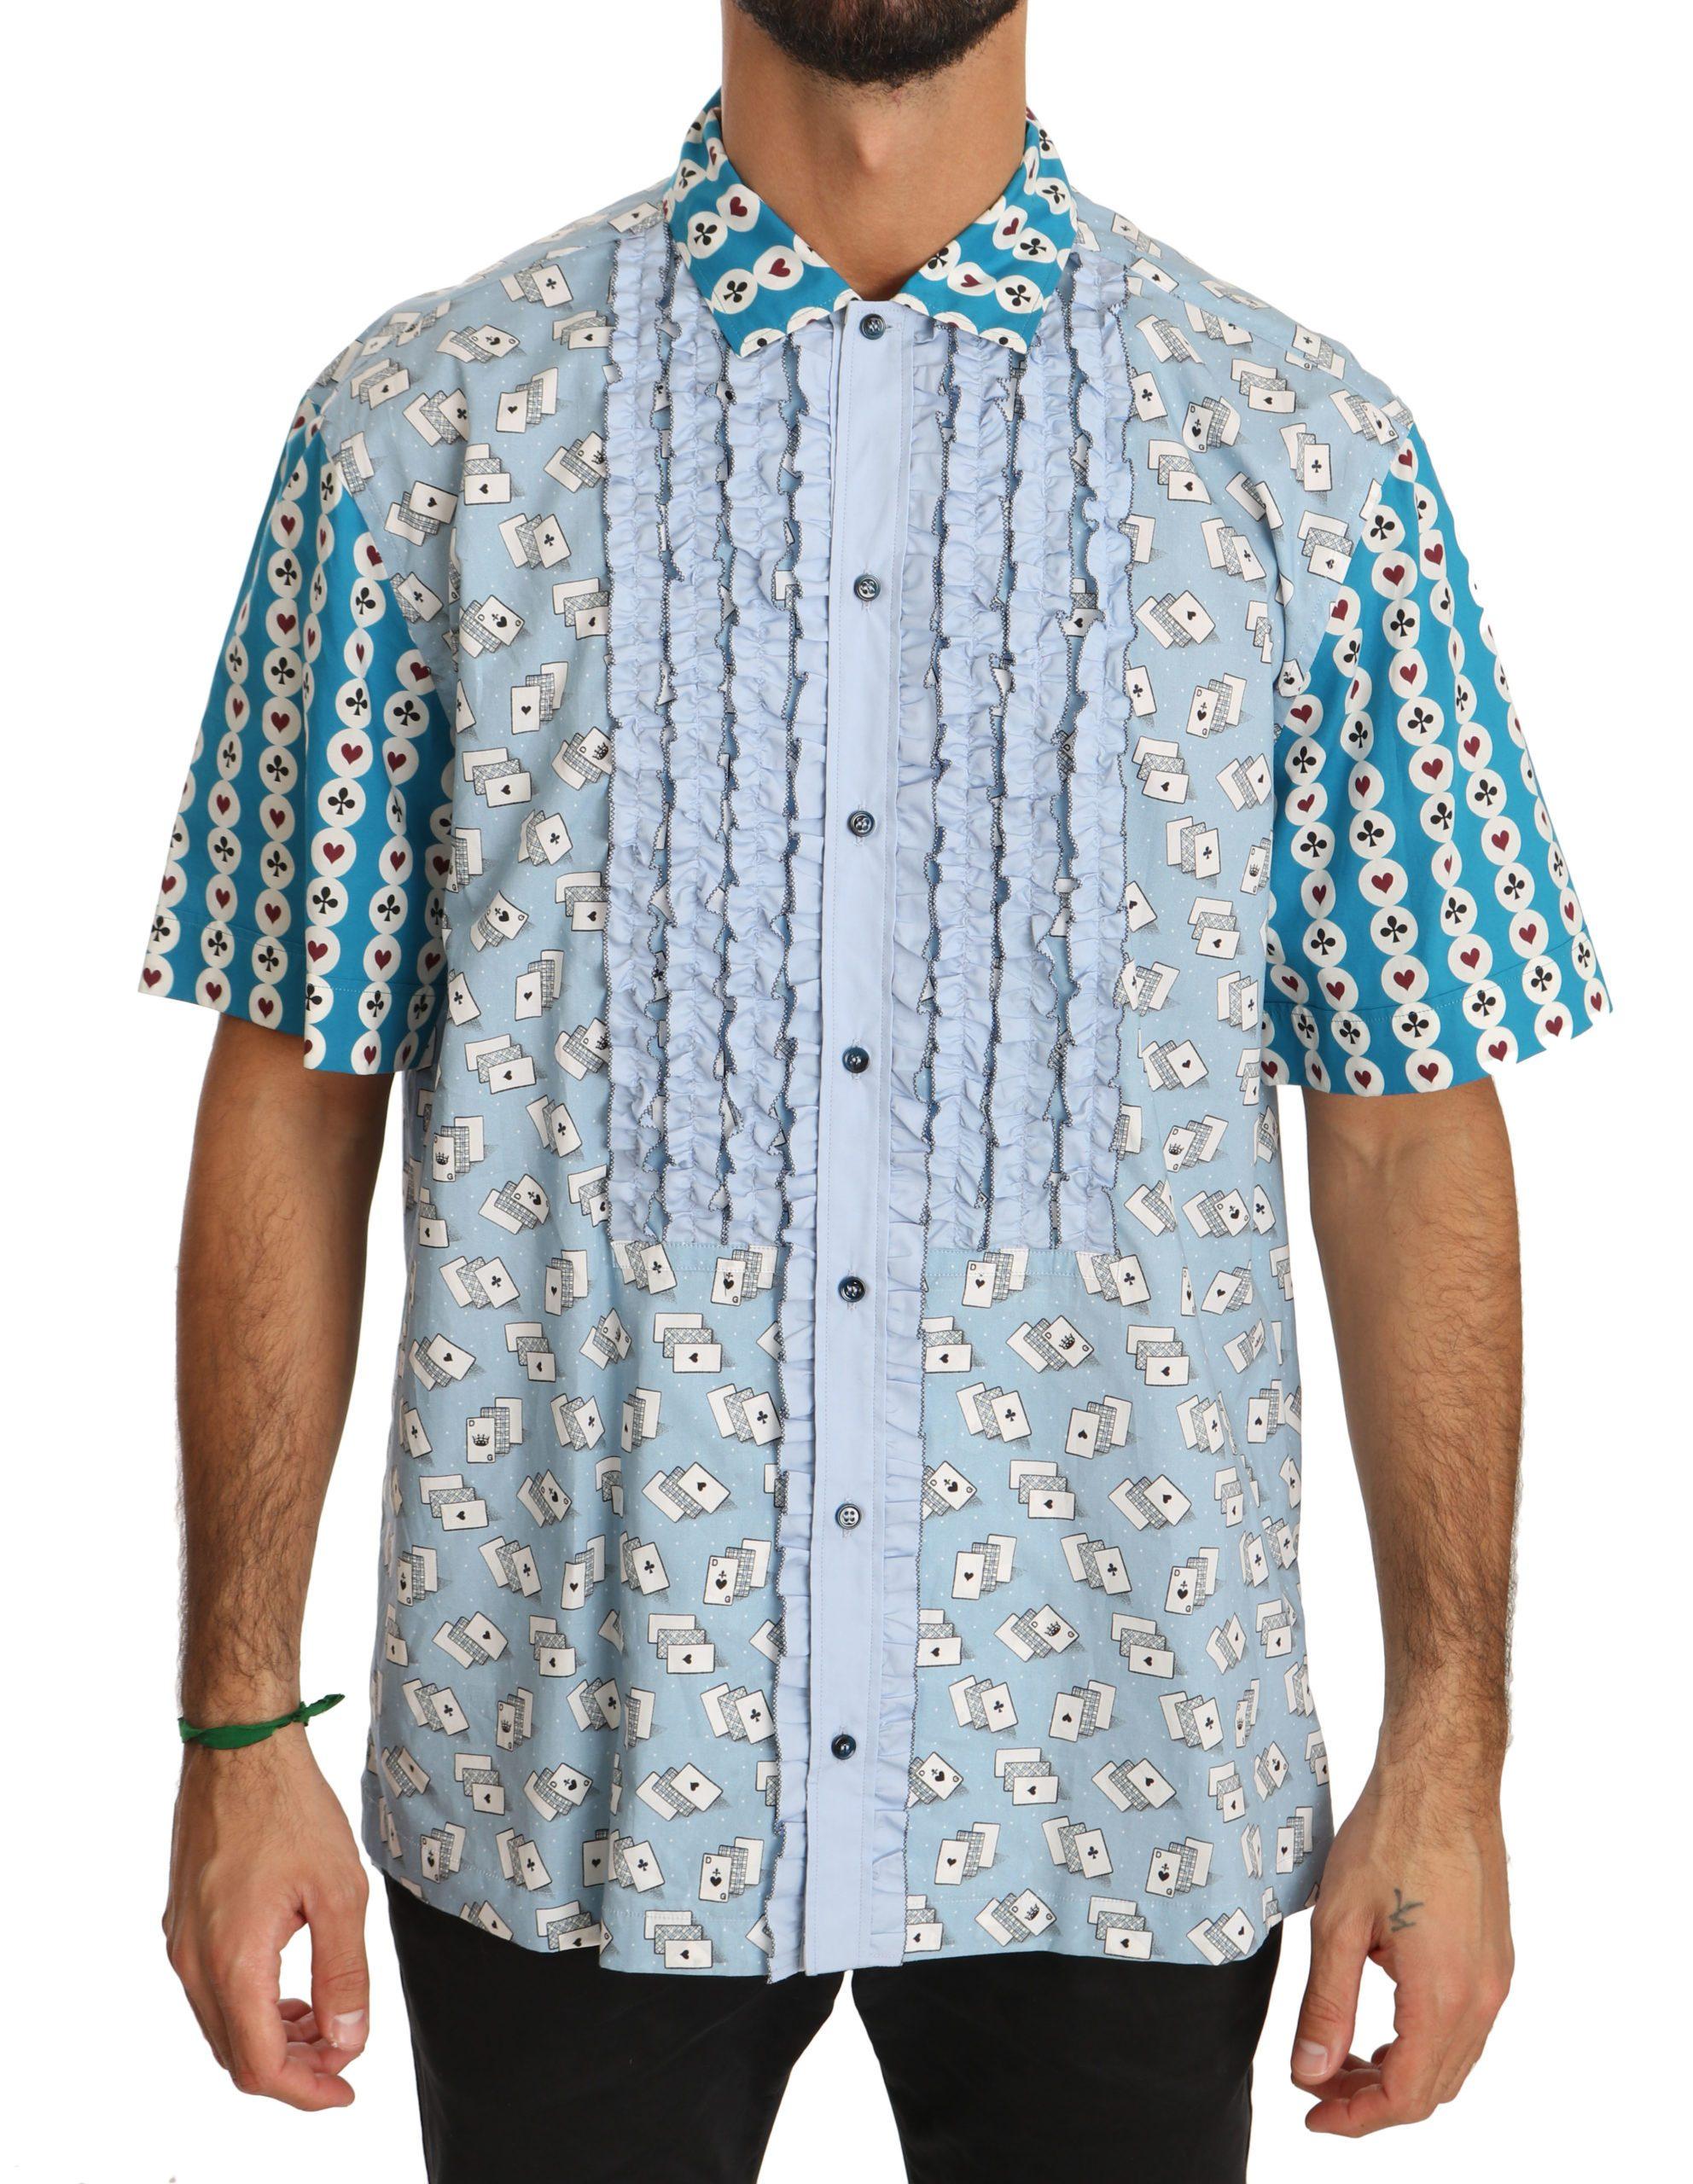 Dolce & Gabbana Men's Deck Of Card Formal Cotton Dress Shirt Blue TSH3903 - IT40 | M